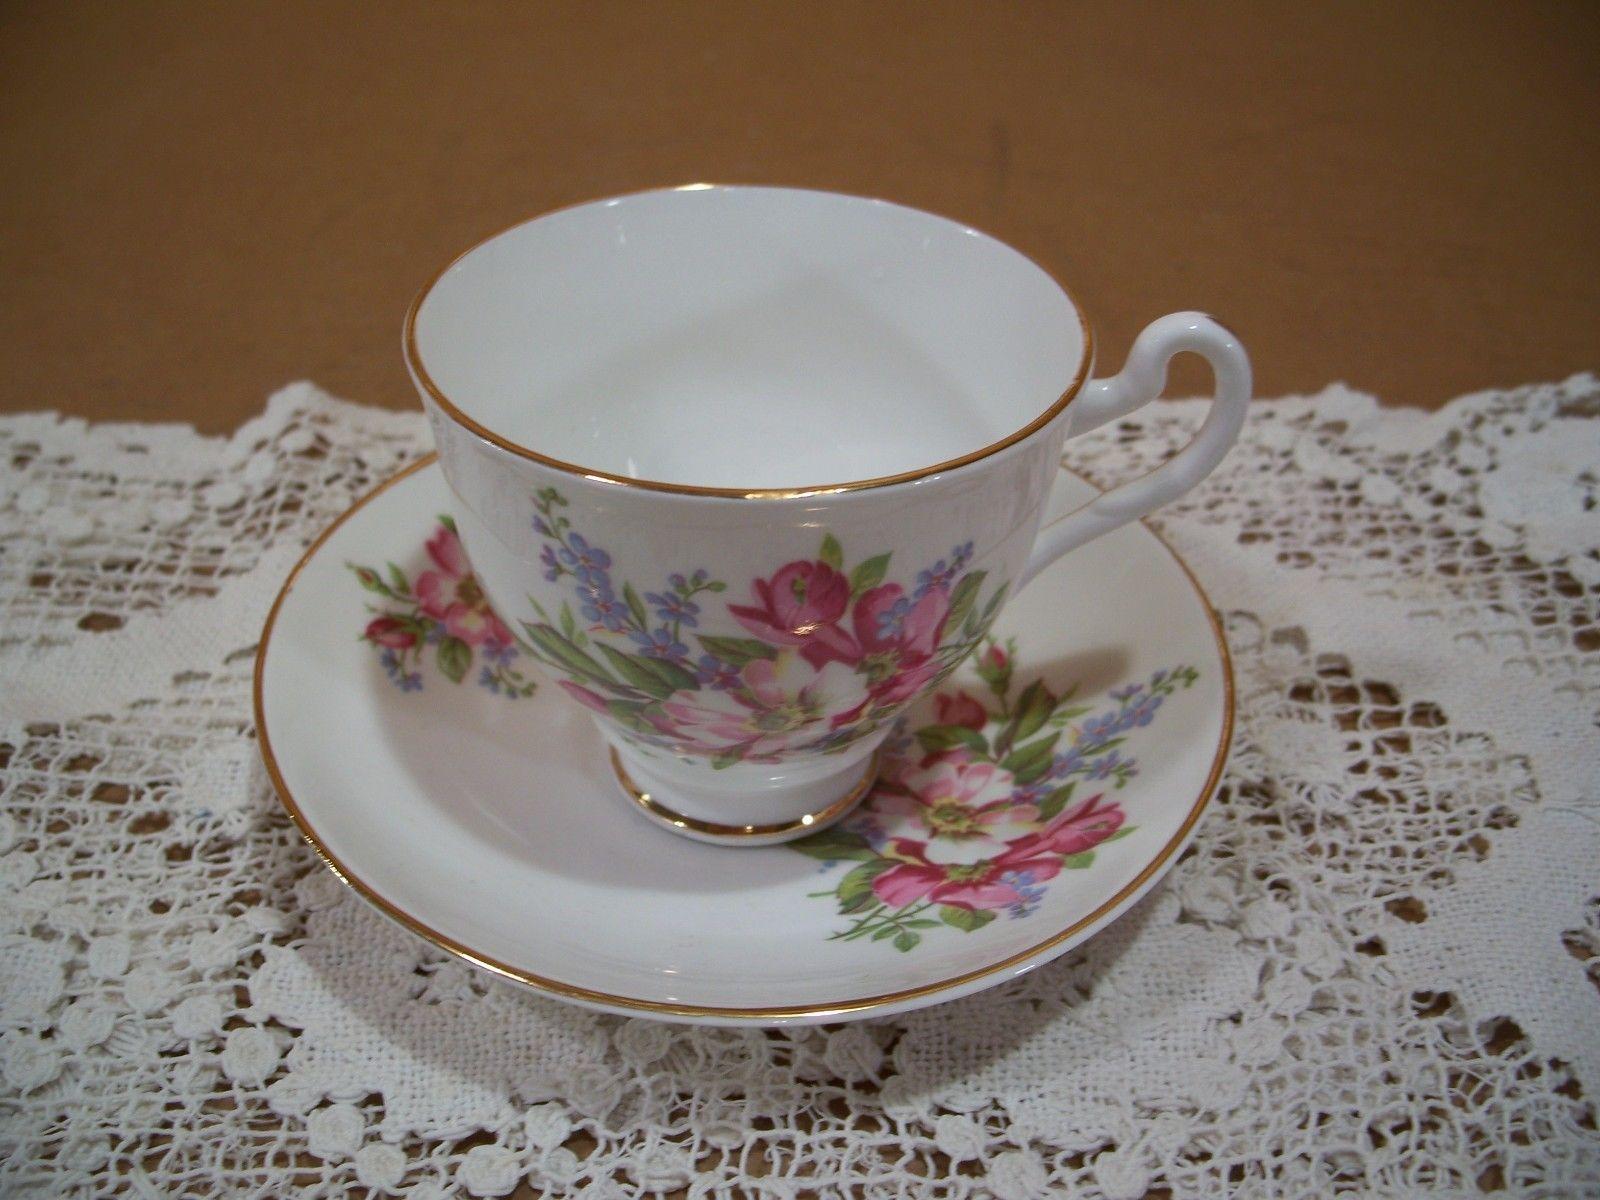 Bone China Tea Sets Made In England My Wallpaper 1600x1200